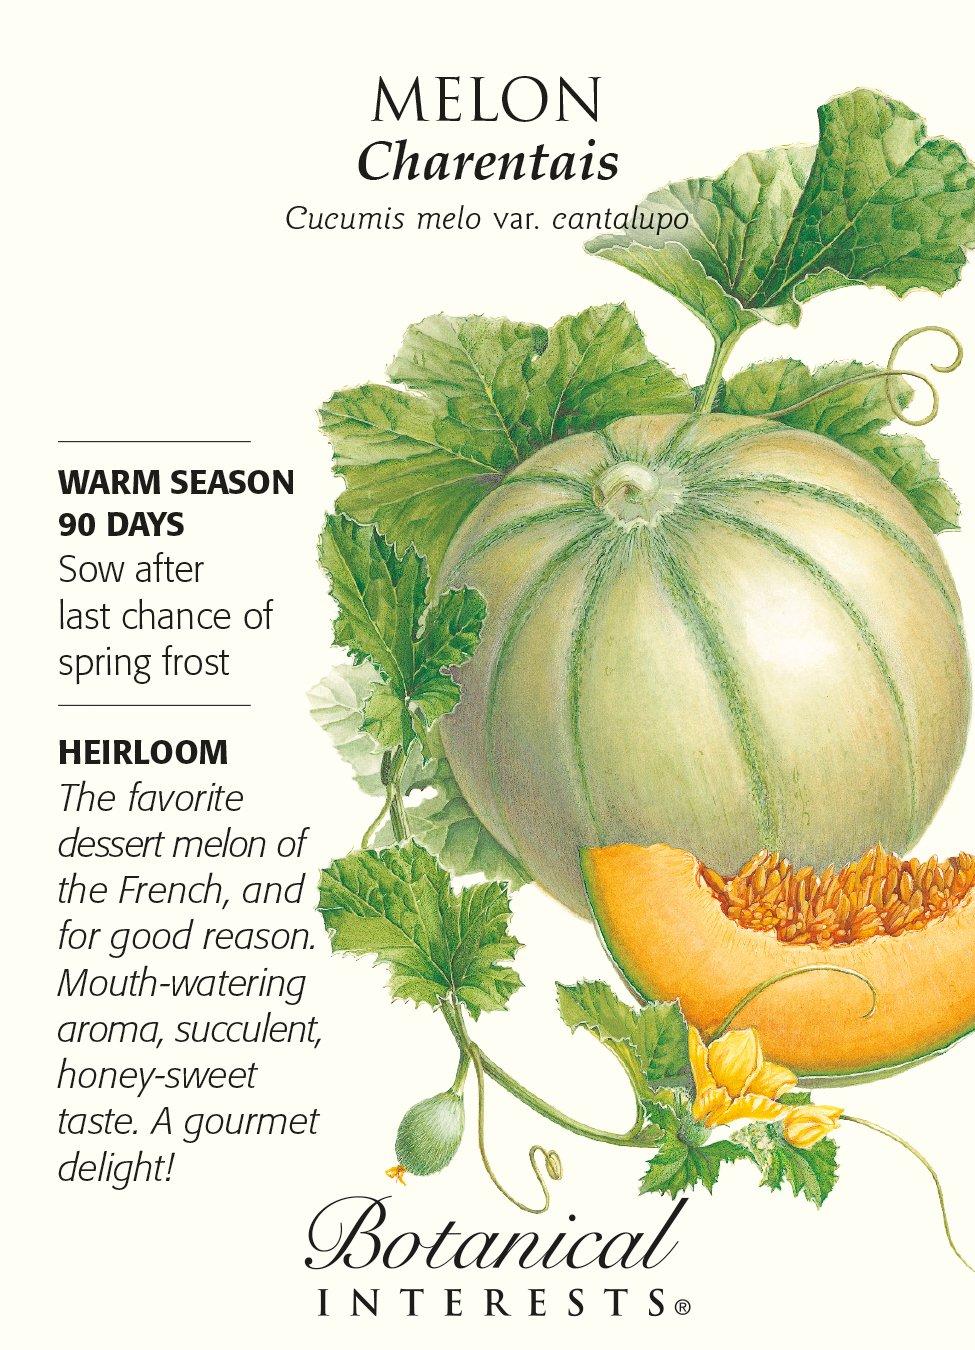 Melon Charentais Seed Botanical Interests 0186 BI - Melon - Charentais